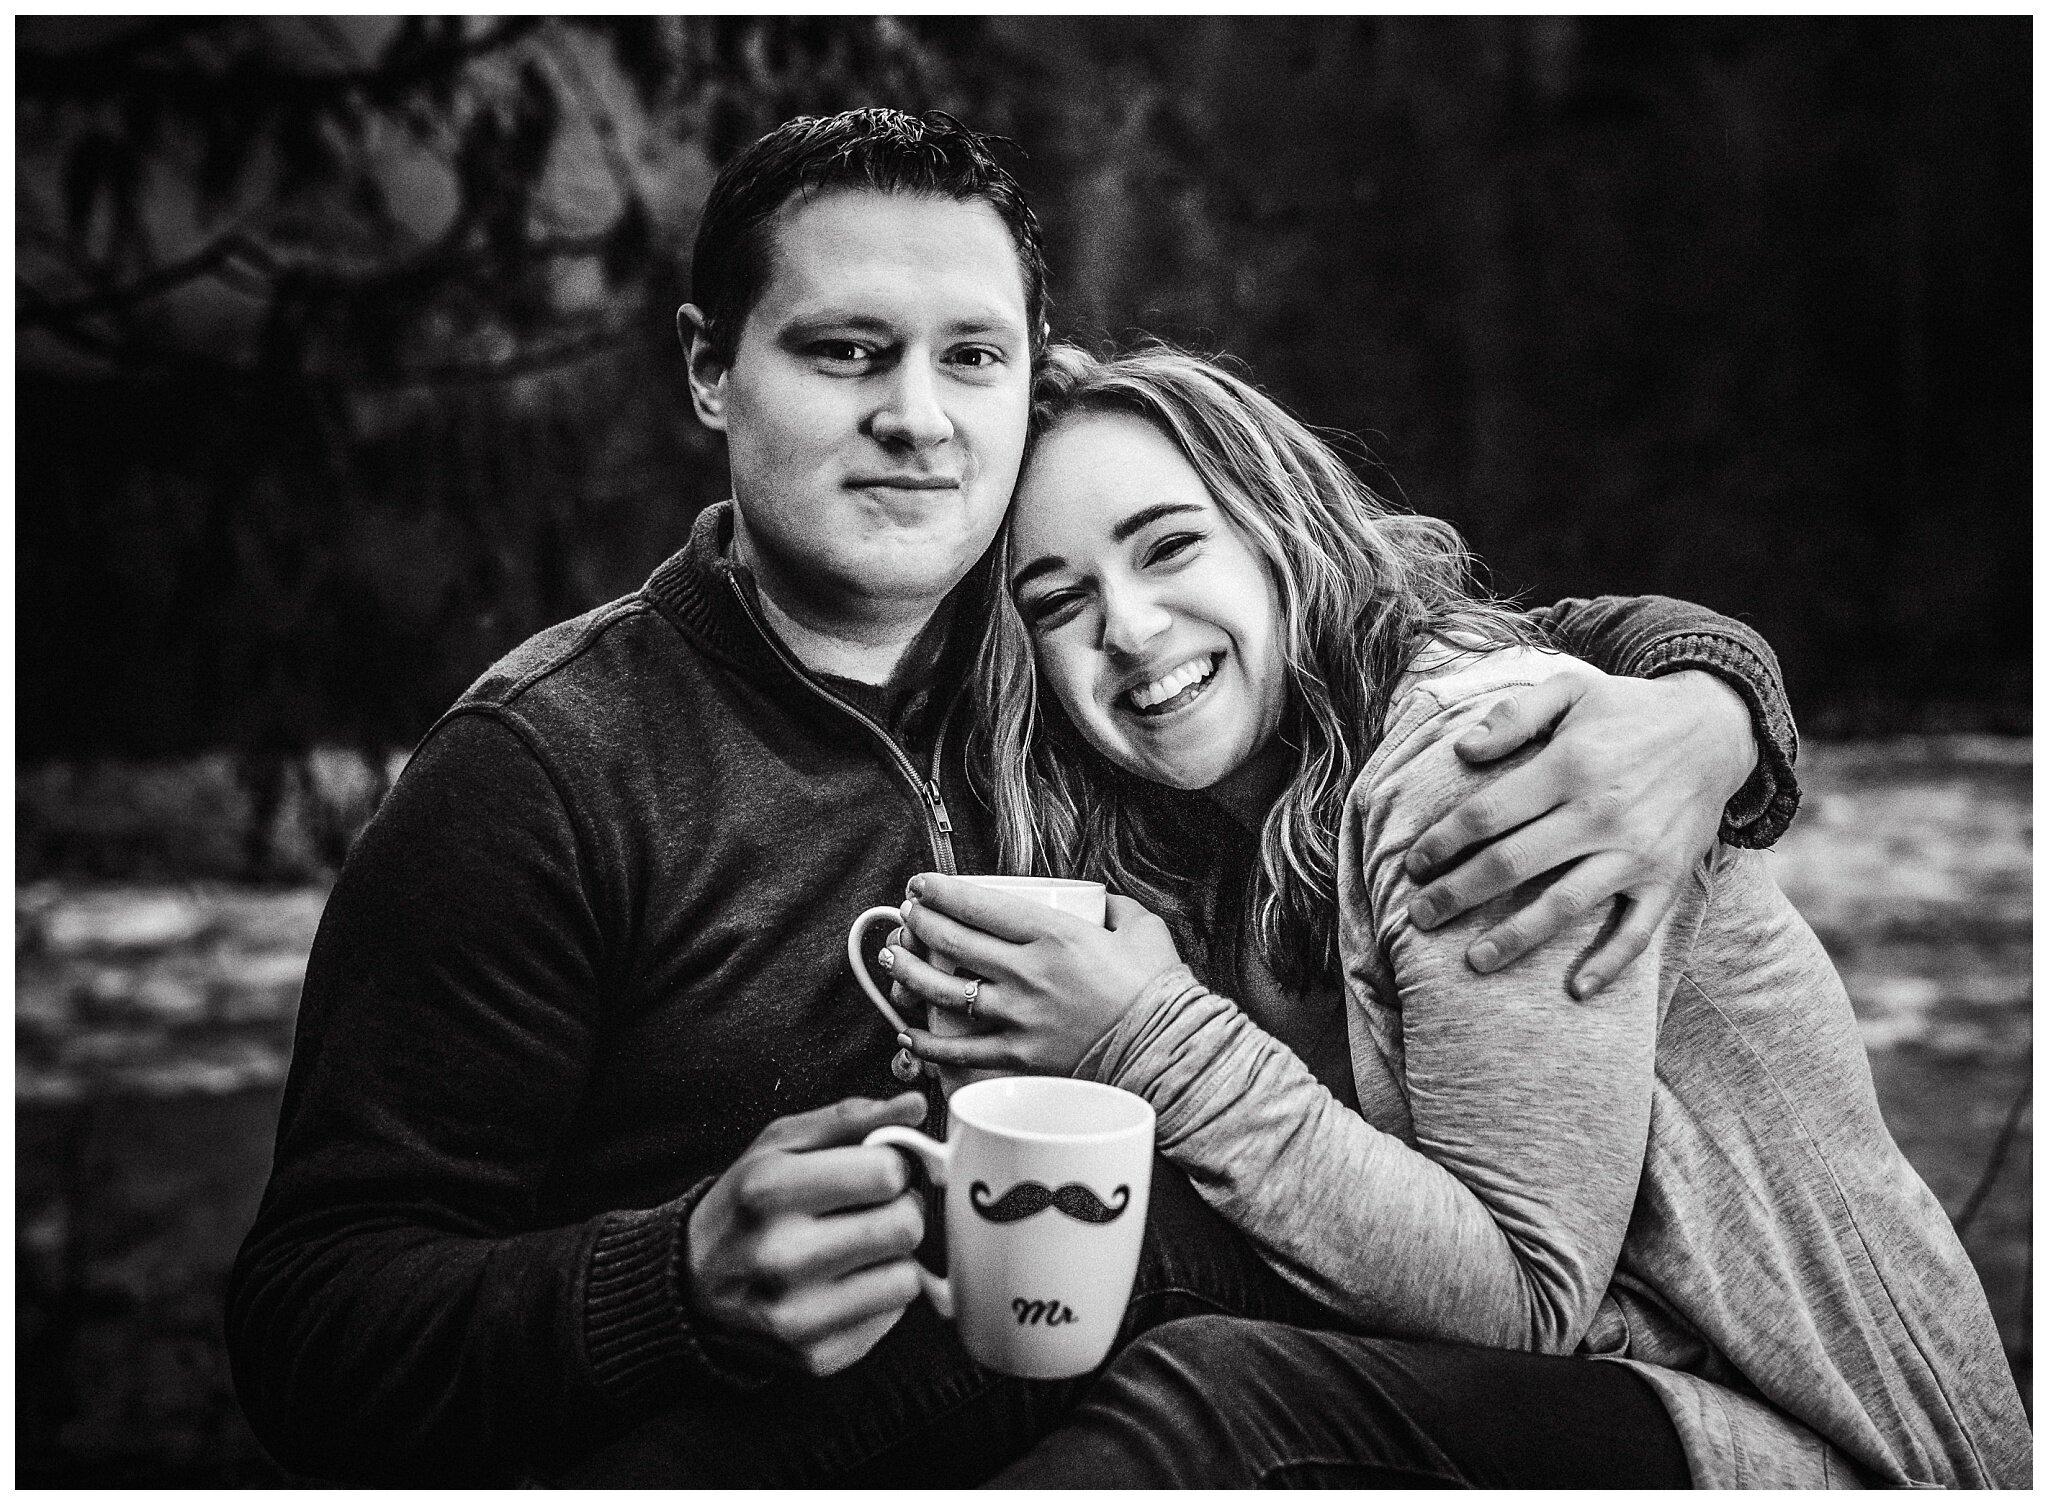 Chilliwack Lake Rainy Winter Engagement Photography Session Couples Photographer_0021.jpg